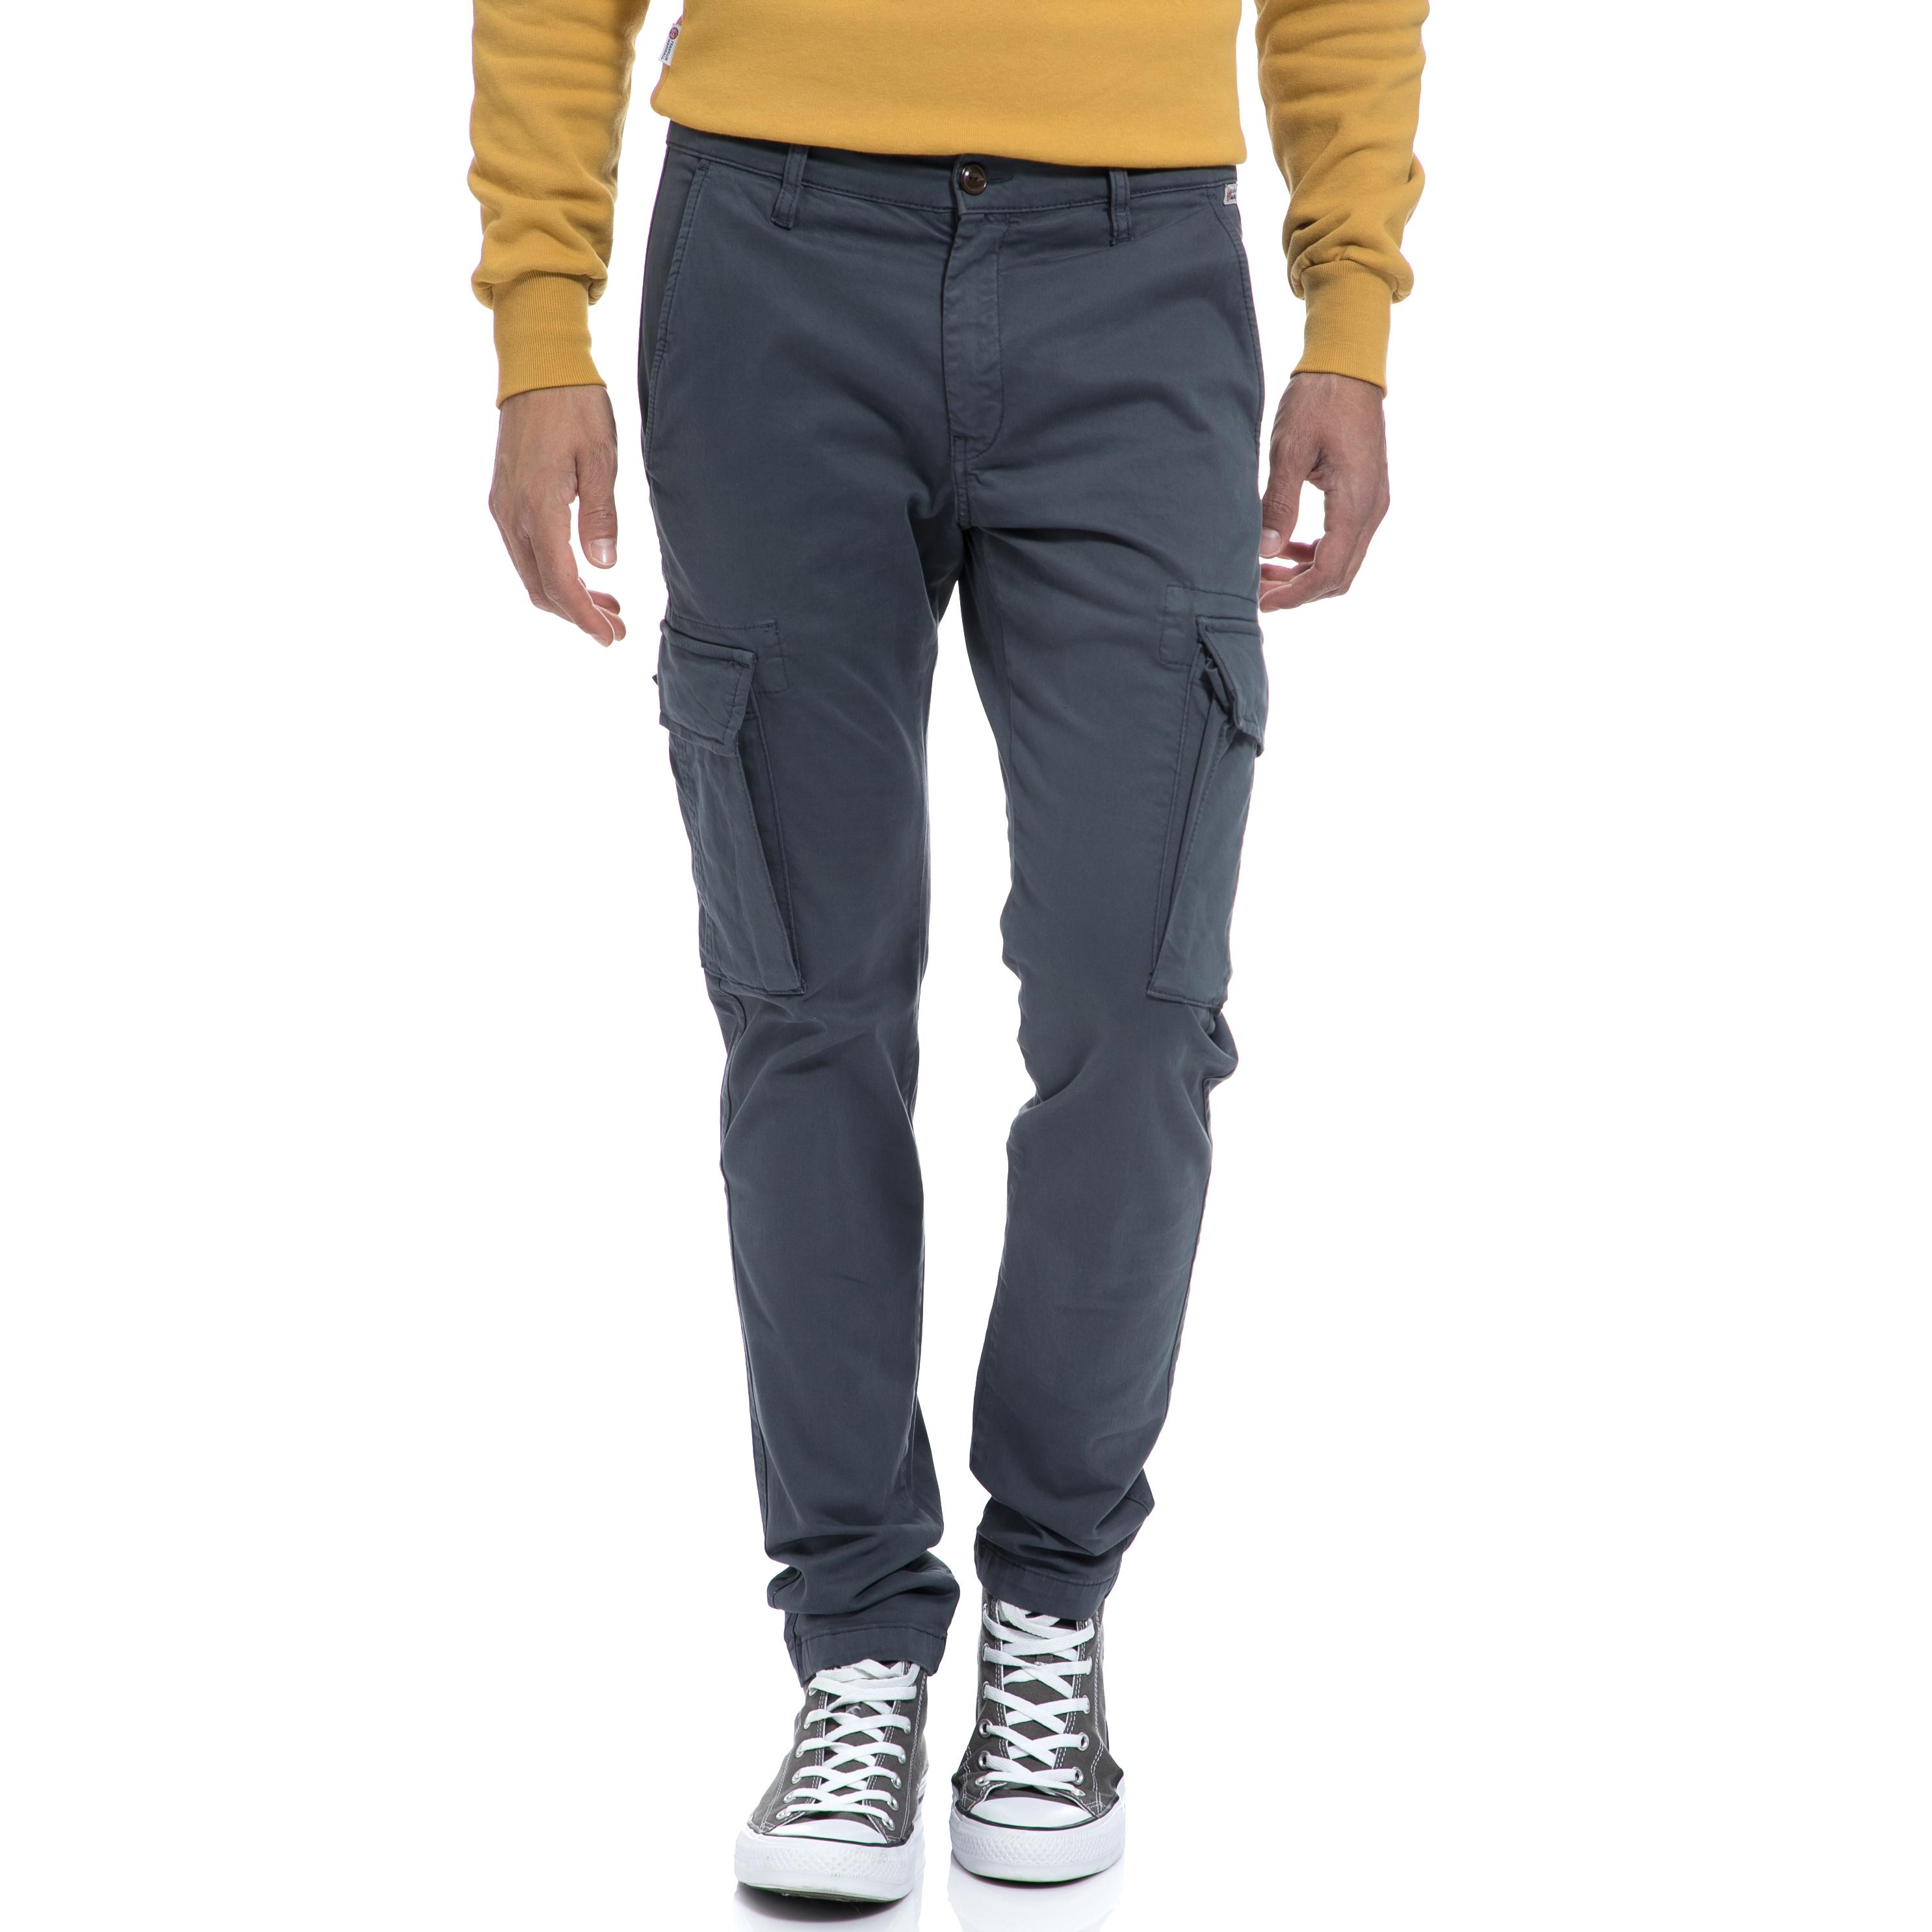 FRANKLIN & MARSHALL – Αντρικό παντελόνι FRANKLIN & MARSHALL γκρι-μπλε